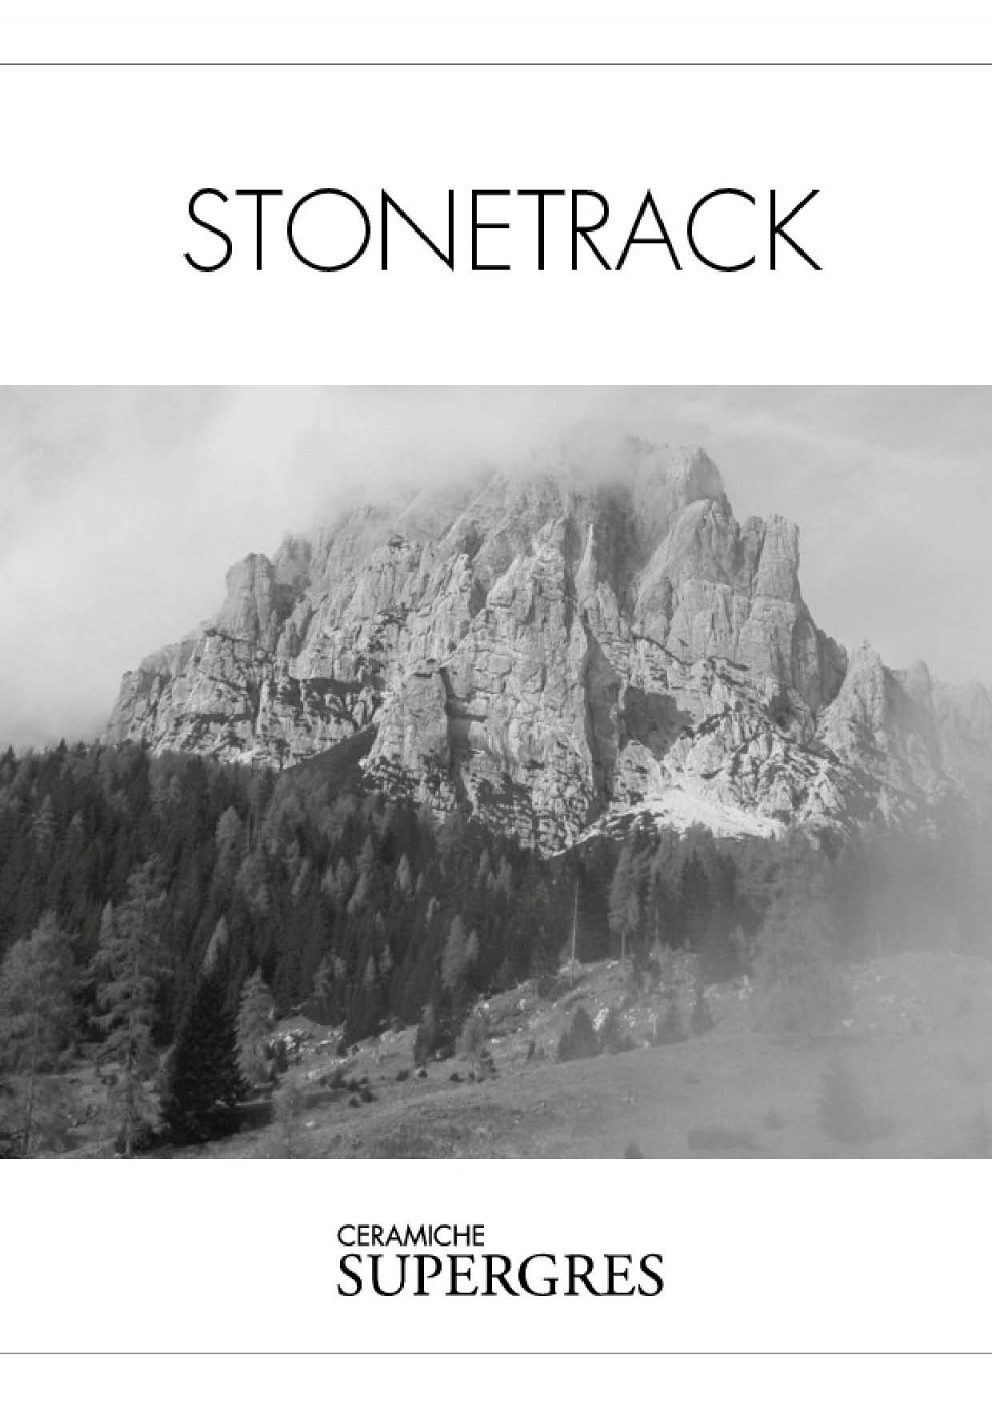 Supergres - Stonetrack